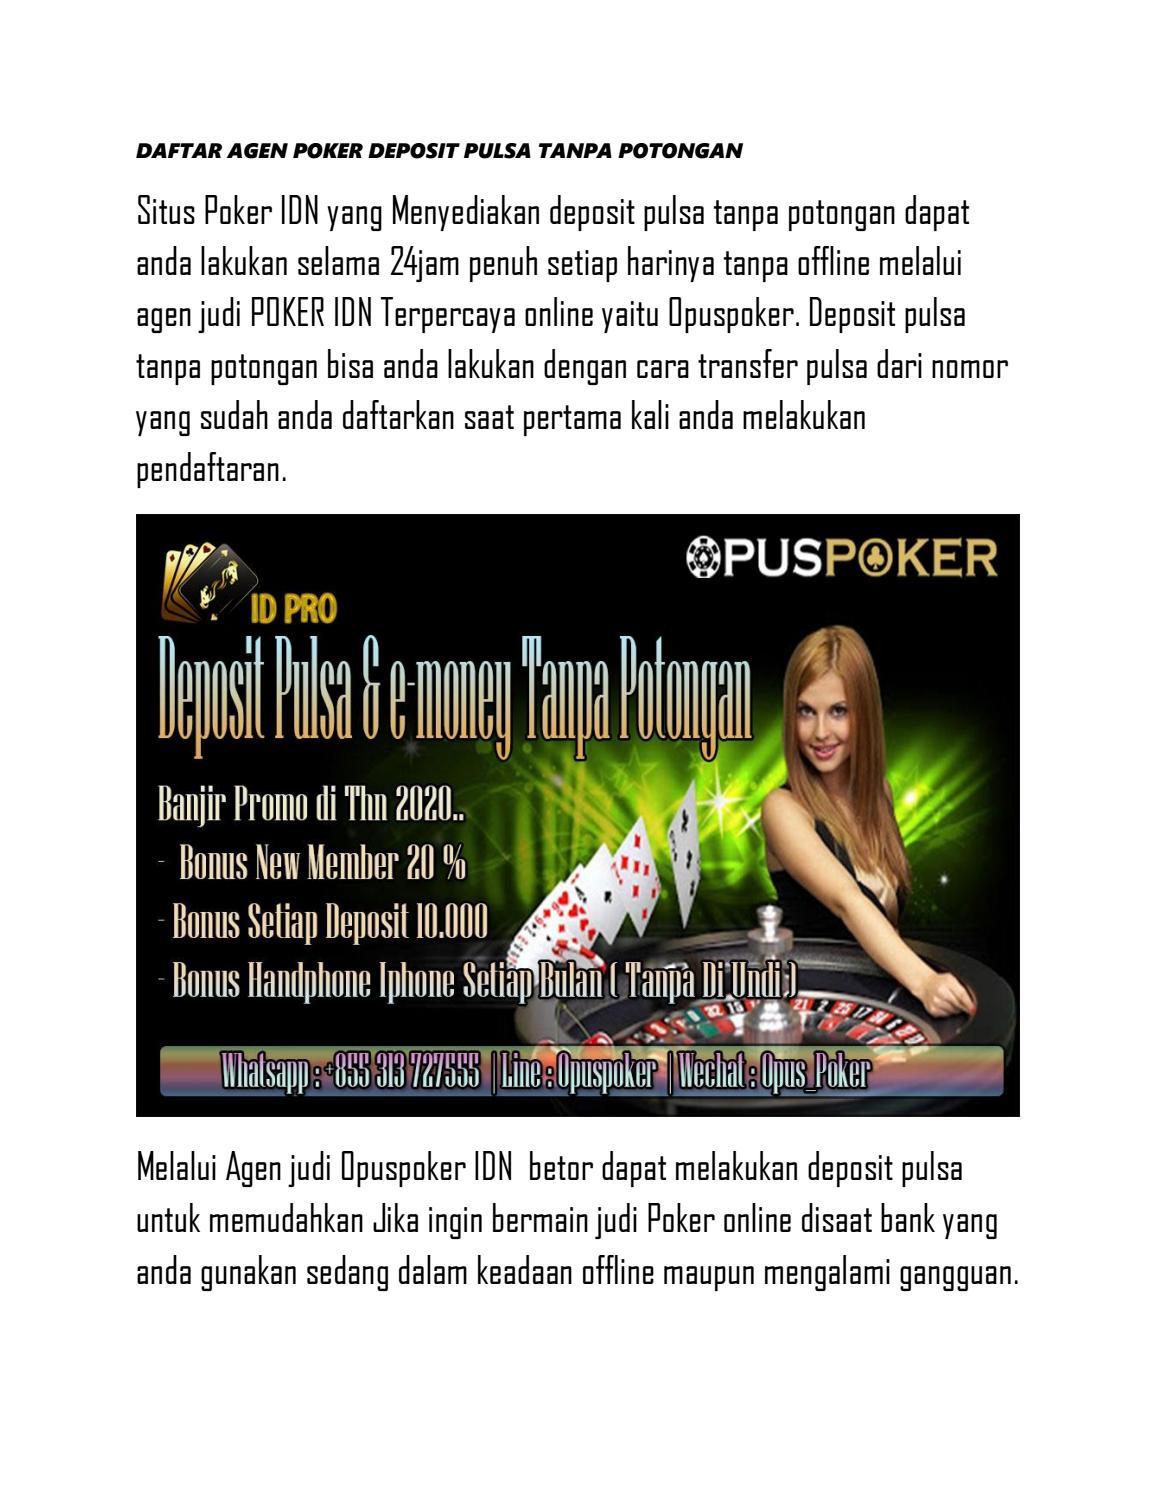 Agen Poker Pulsa Agen Judi Online Situs Judi Online Situs Poker Pulsa Bandar Judi Online By Agen Poker Pulsa Agen Judi Online Situs Judi Online Bandar Judi Online Issuu